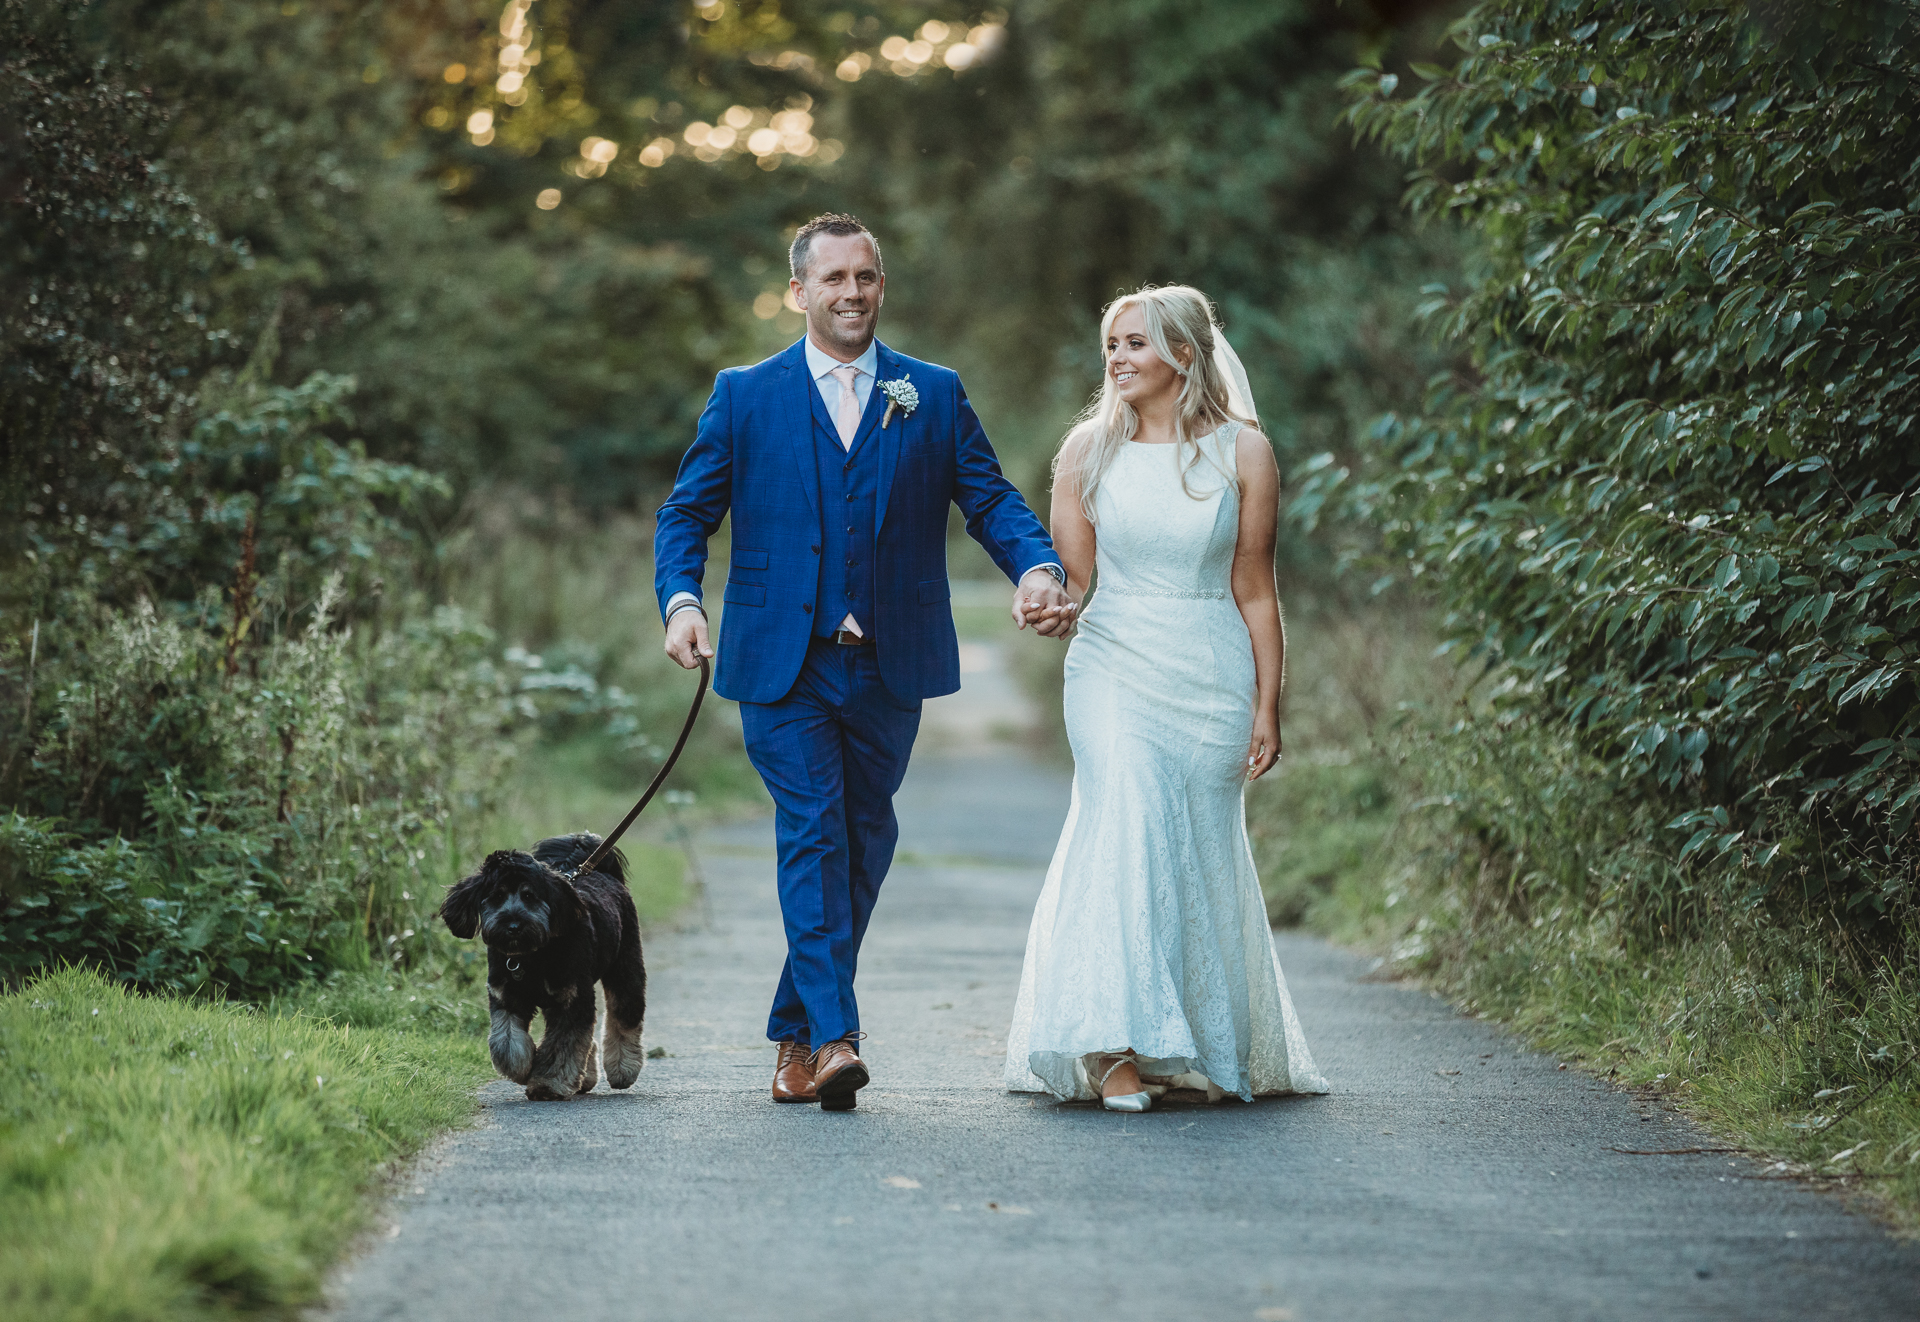 relaxed wedding photography, bridal couple walking with dog